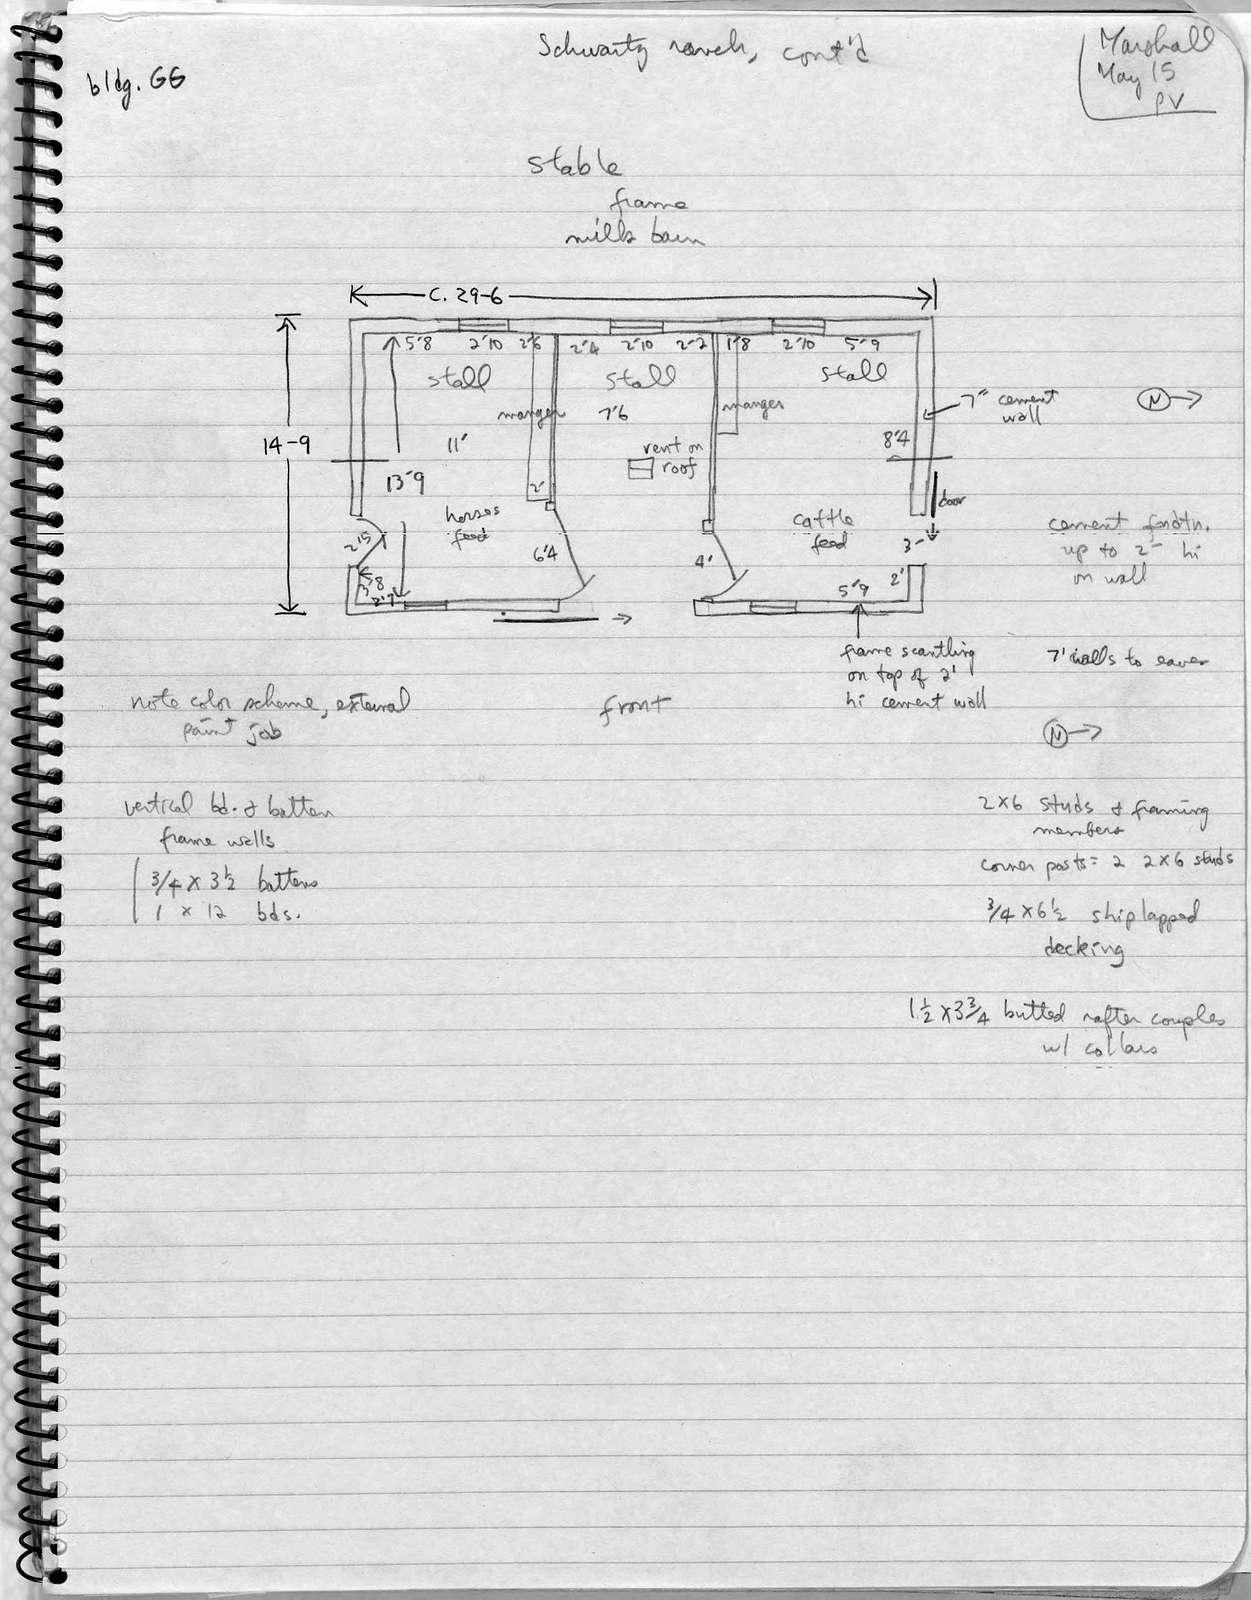 Barn Plan, Schwartz Ranch